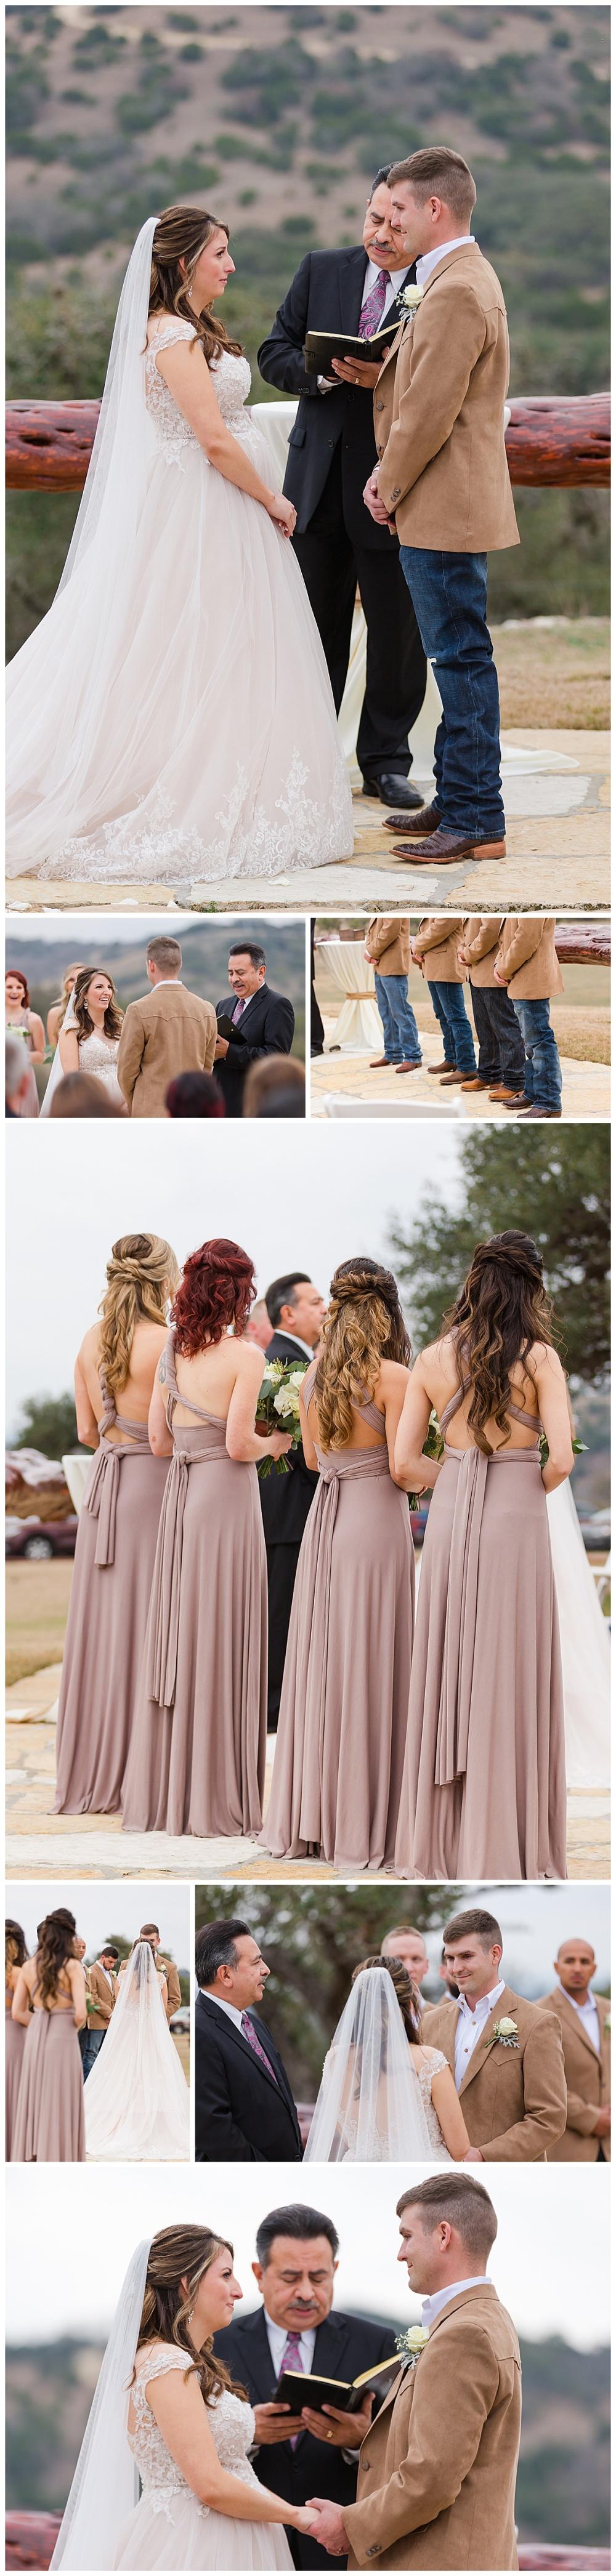 Wedding-Photographer-Texas-Hill-Country-Happy-H-Ranch-Comfor-Texas-Carly-Barton-Photography_0023.jpg